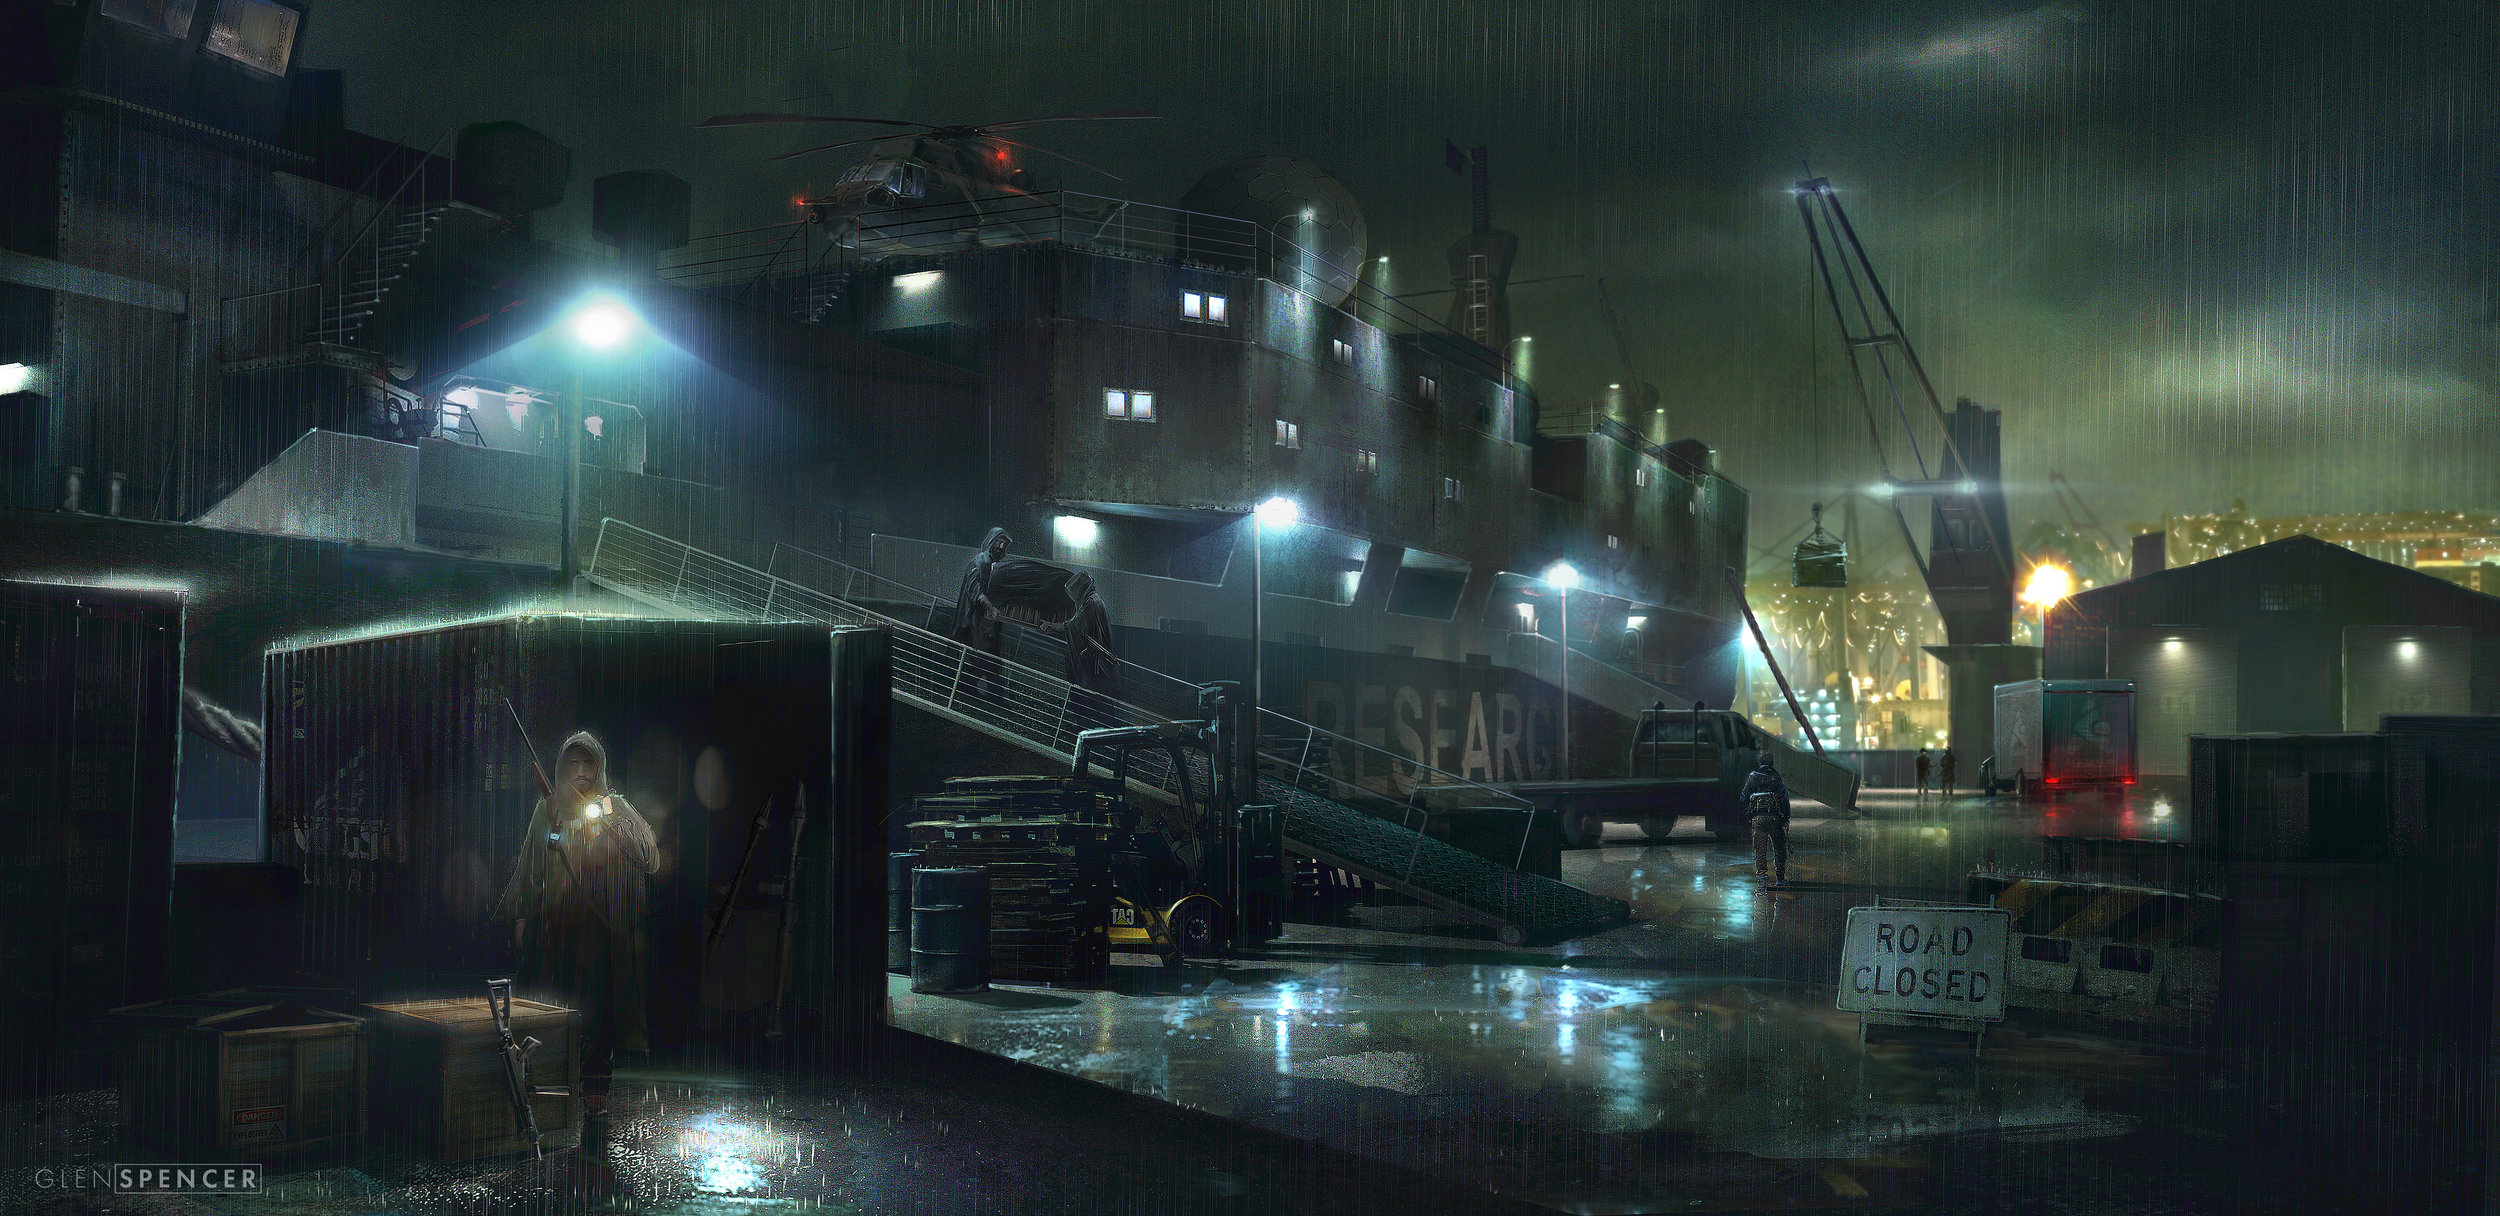 Docks_Flat.jpg